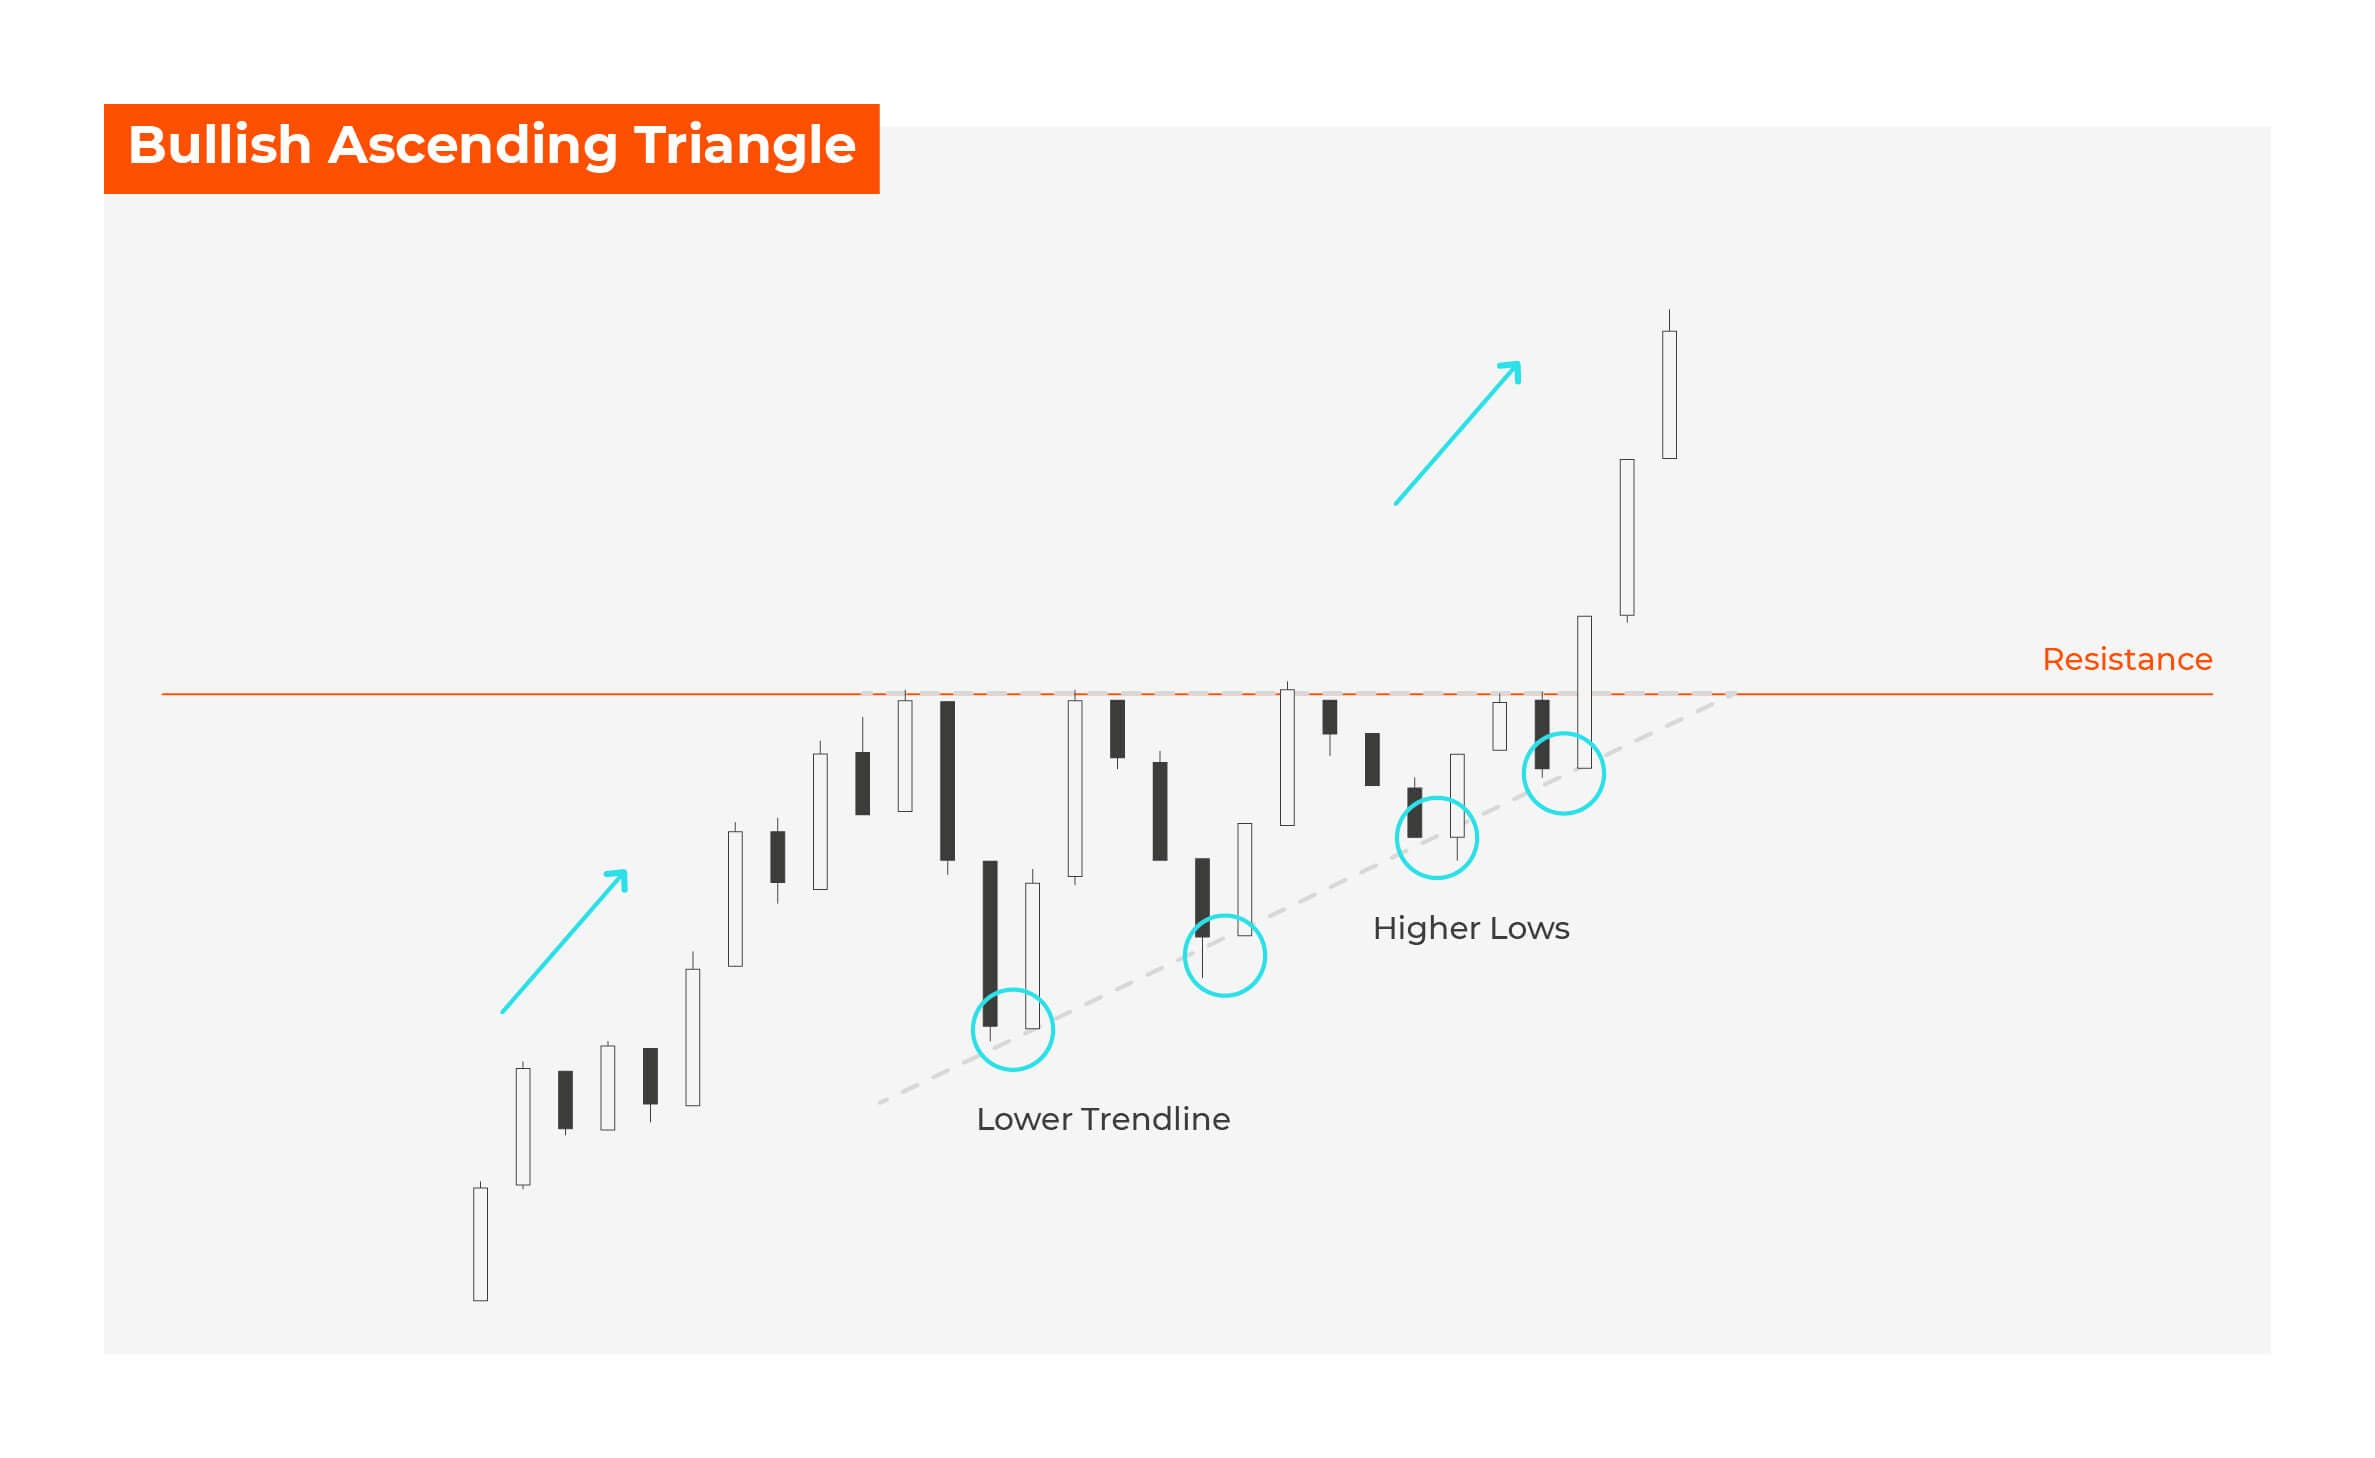 Bullish Ascending Triangle